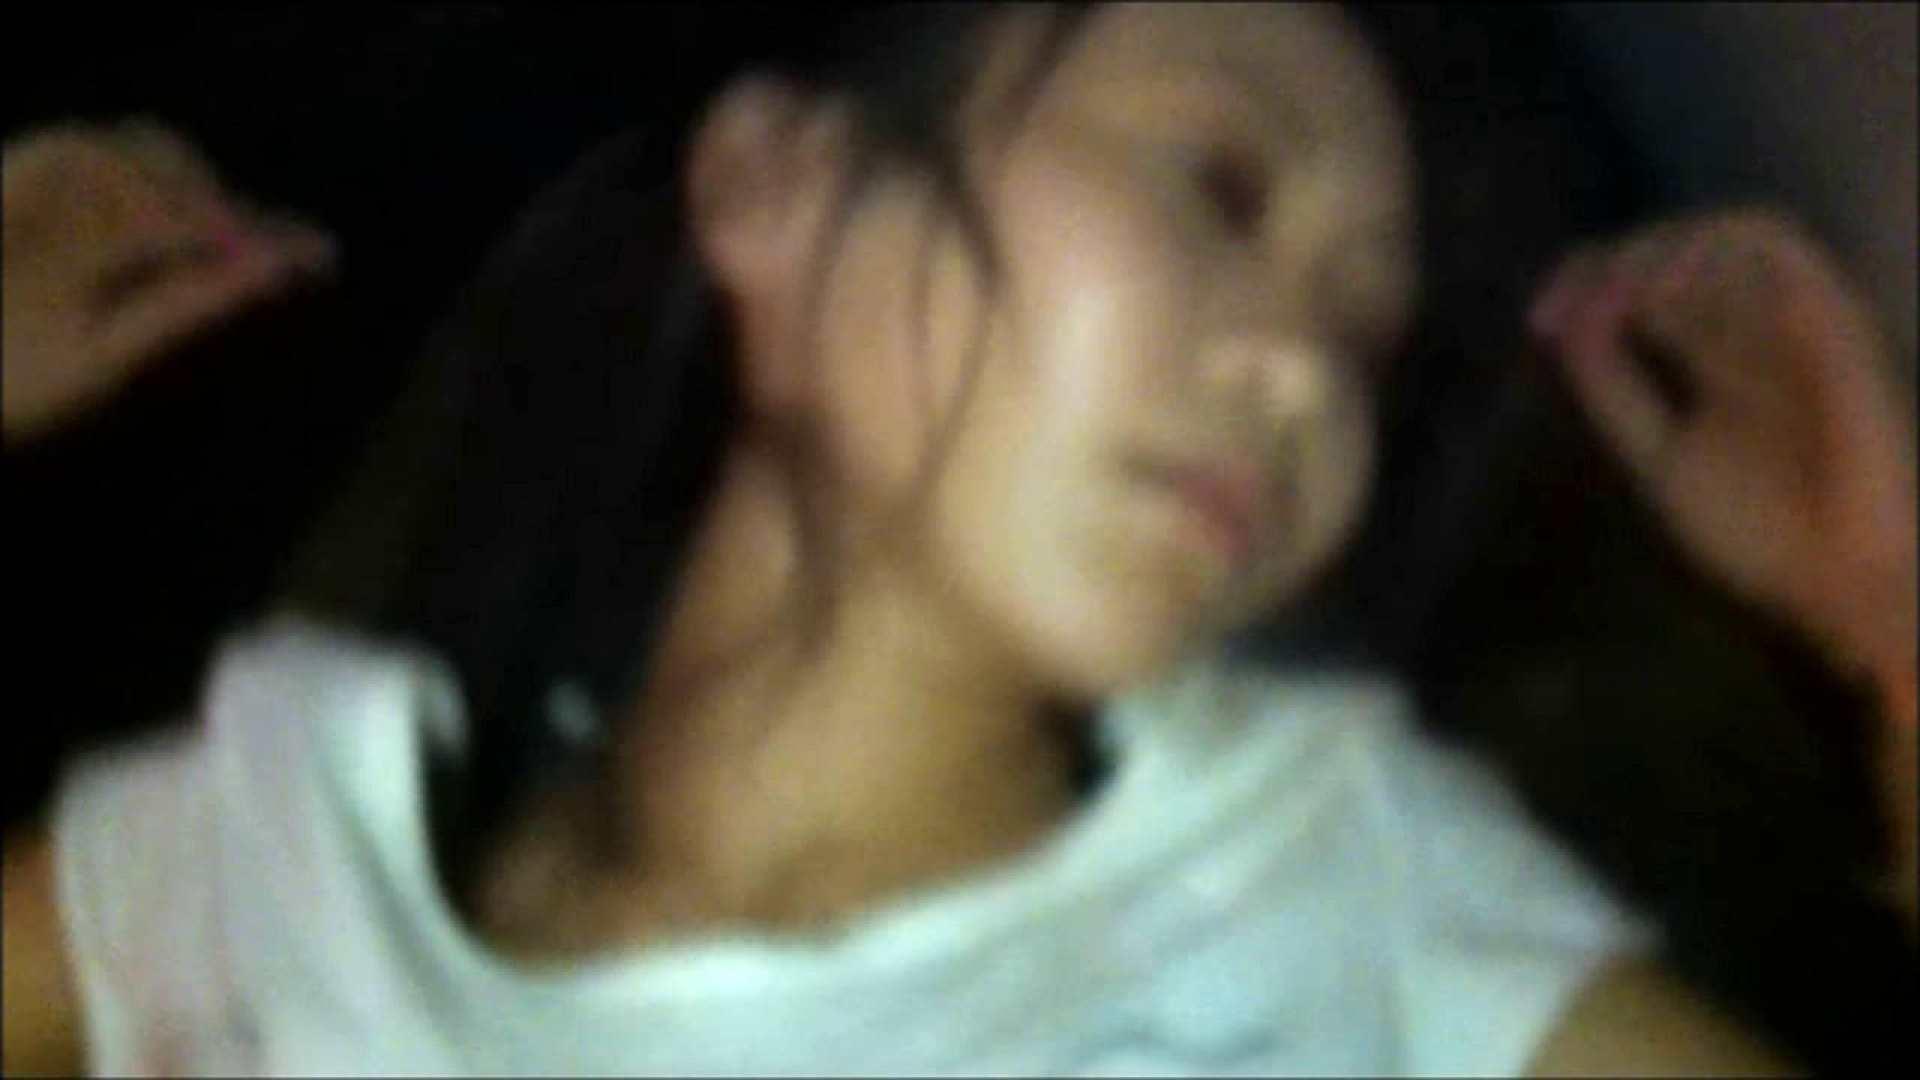 vol.18 【NSちゃん(2回目)】エステティシャン23歳 完全体成功! イタズラ のぞき濡れ場動画紹介 40pic 4